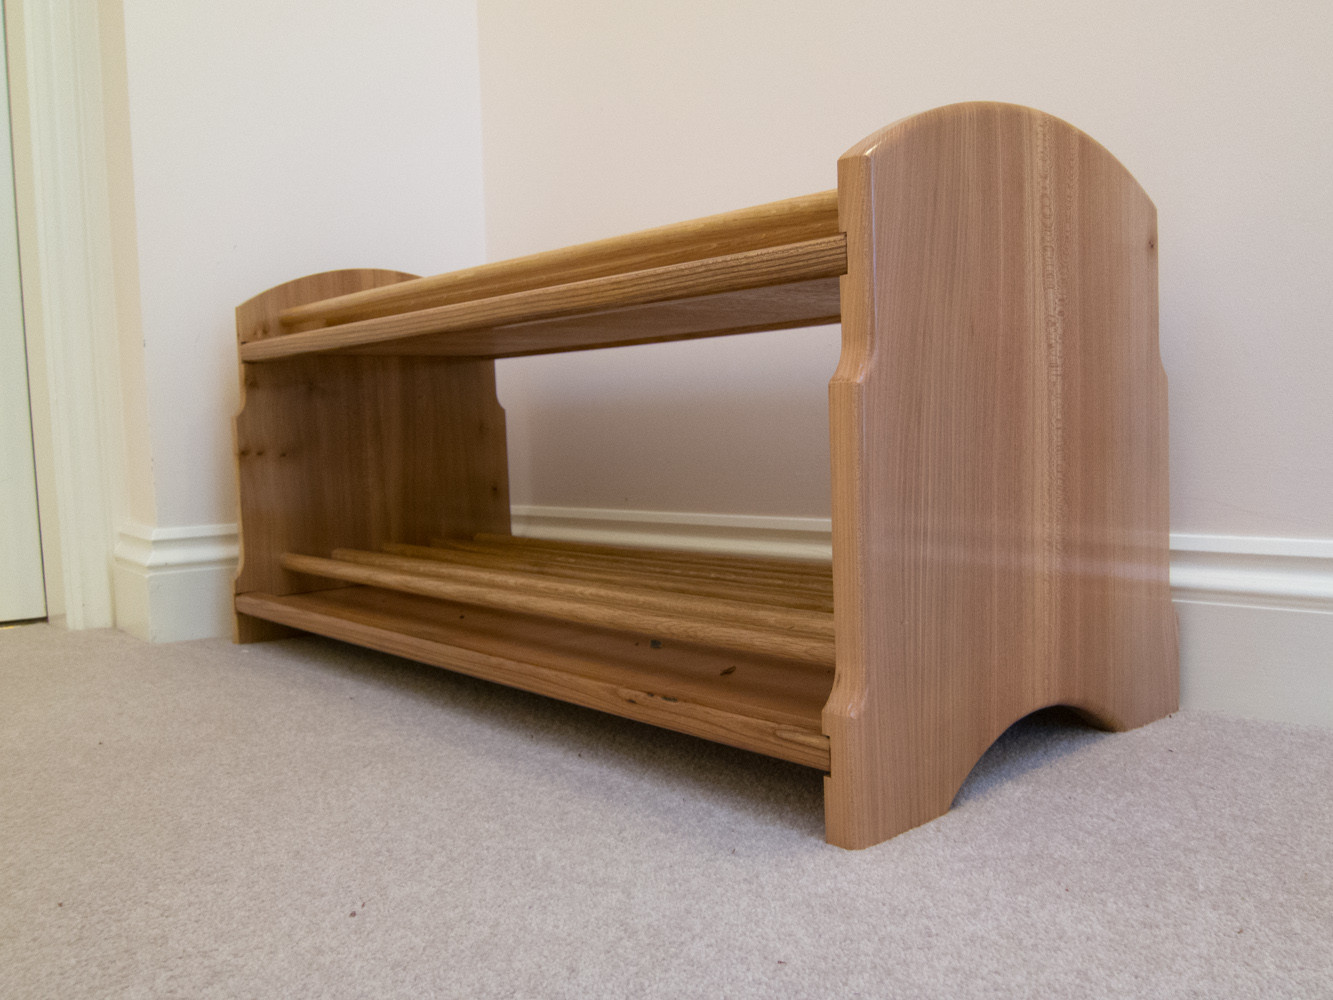 Woodcraft -12.jpg